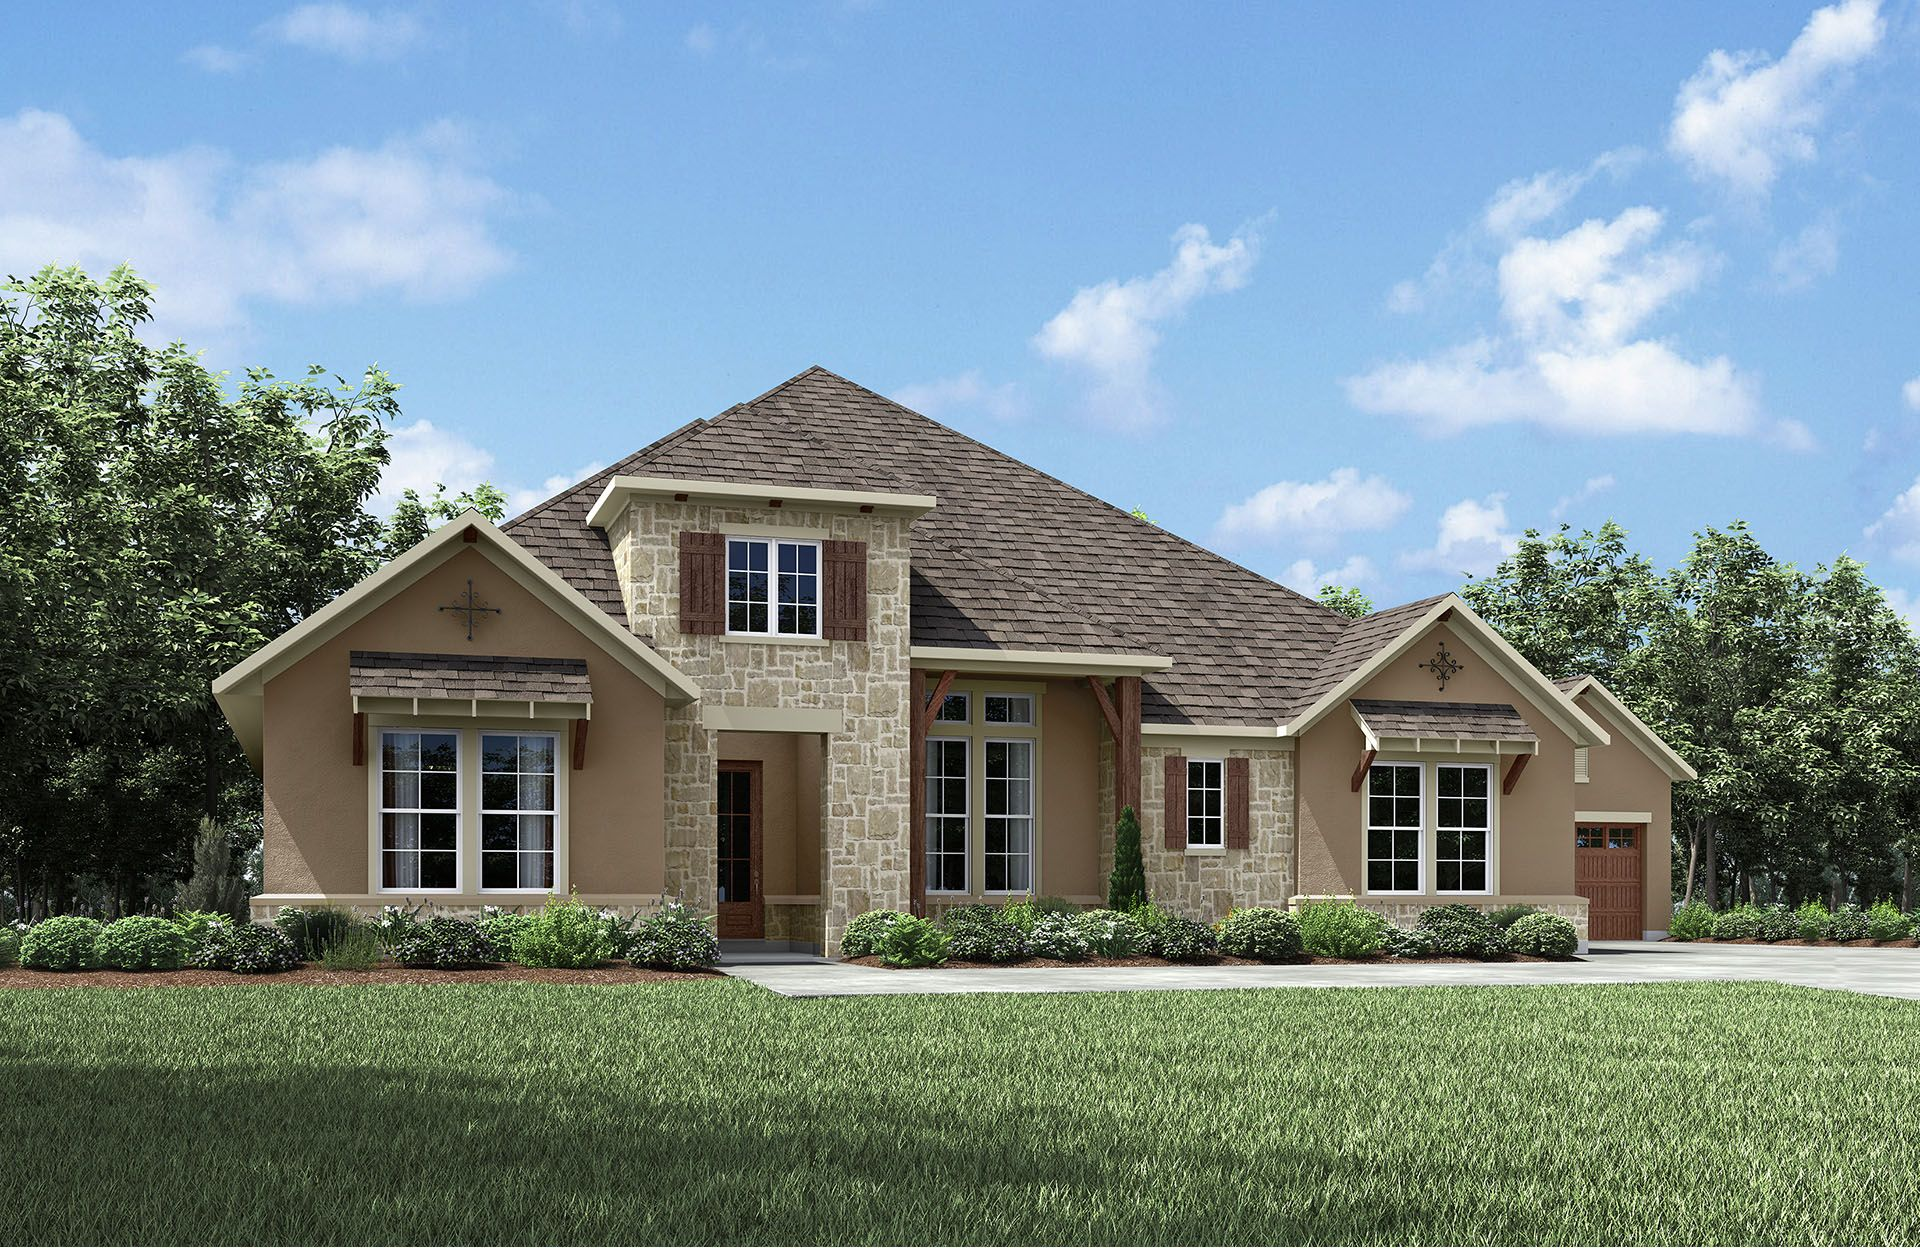 Single Family for Sale at Royal Brook At Kingwood - Castella Ii 3306 Lockridge Harbor Lane Porter, Texas 77365 United States